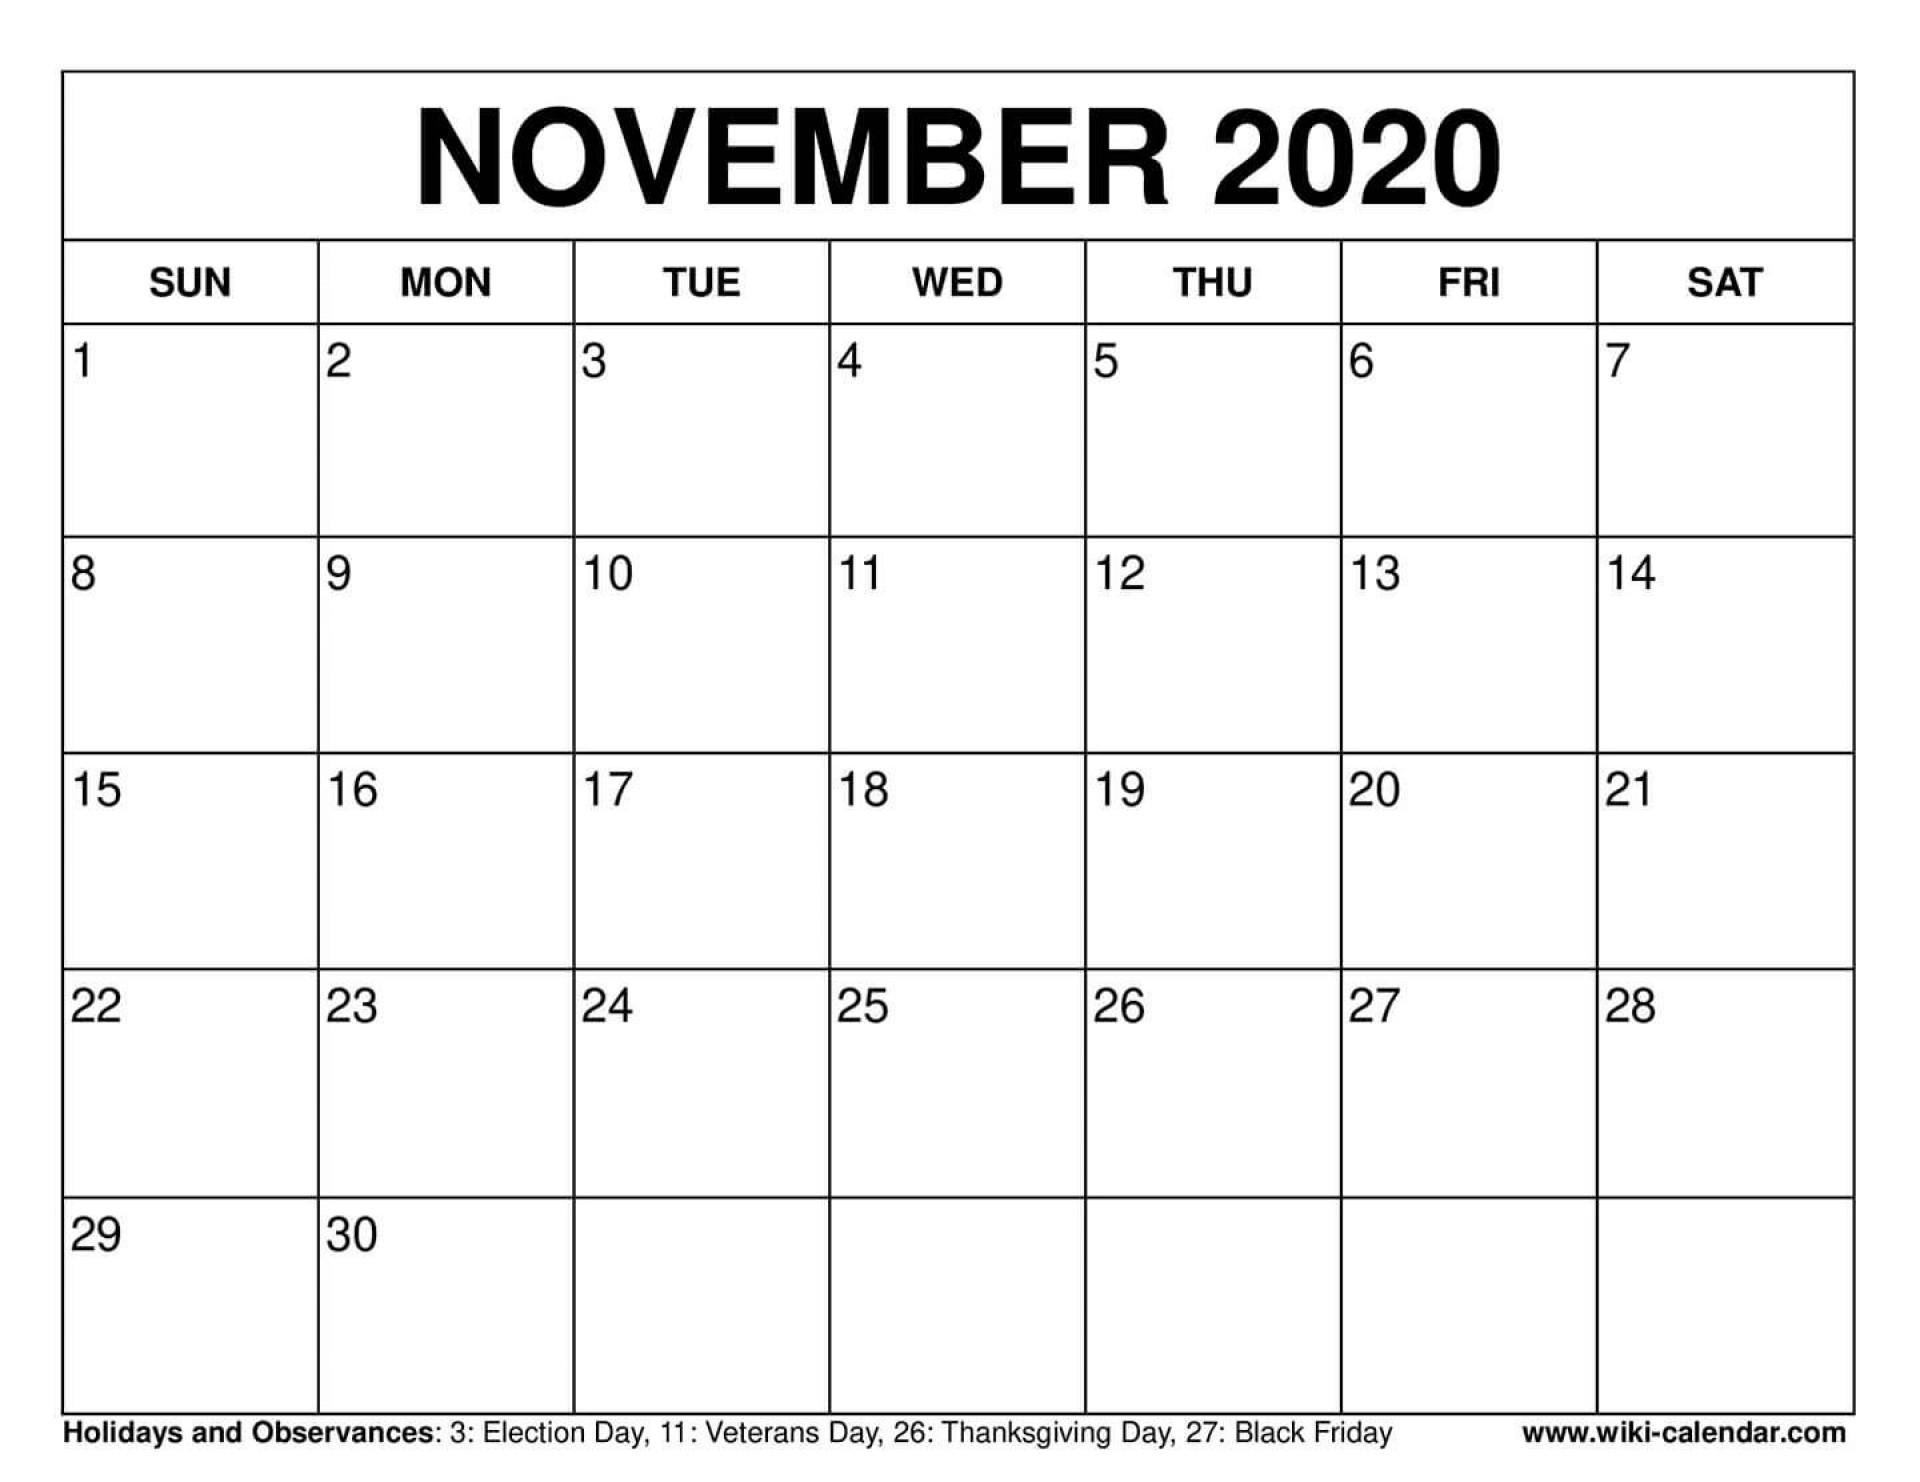 003 Fearsome Printable Calendar Template November 2020 Sample  Free1920